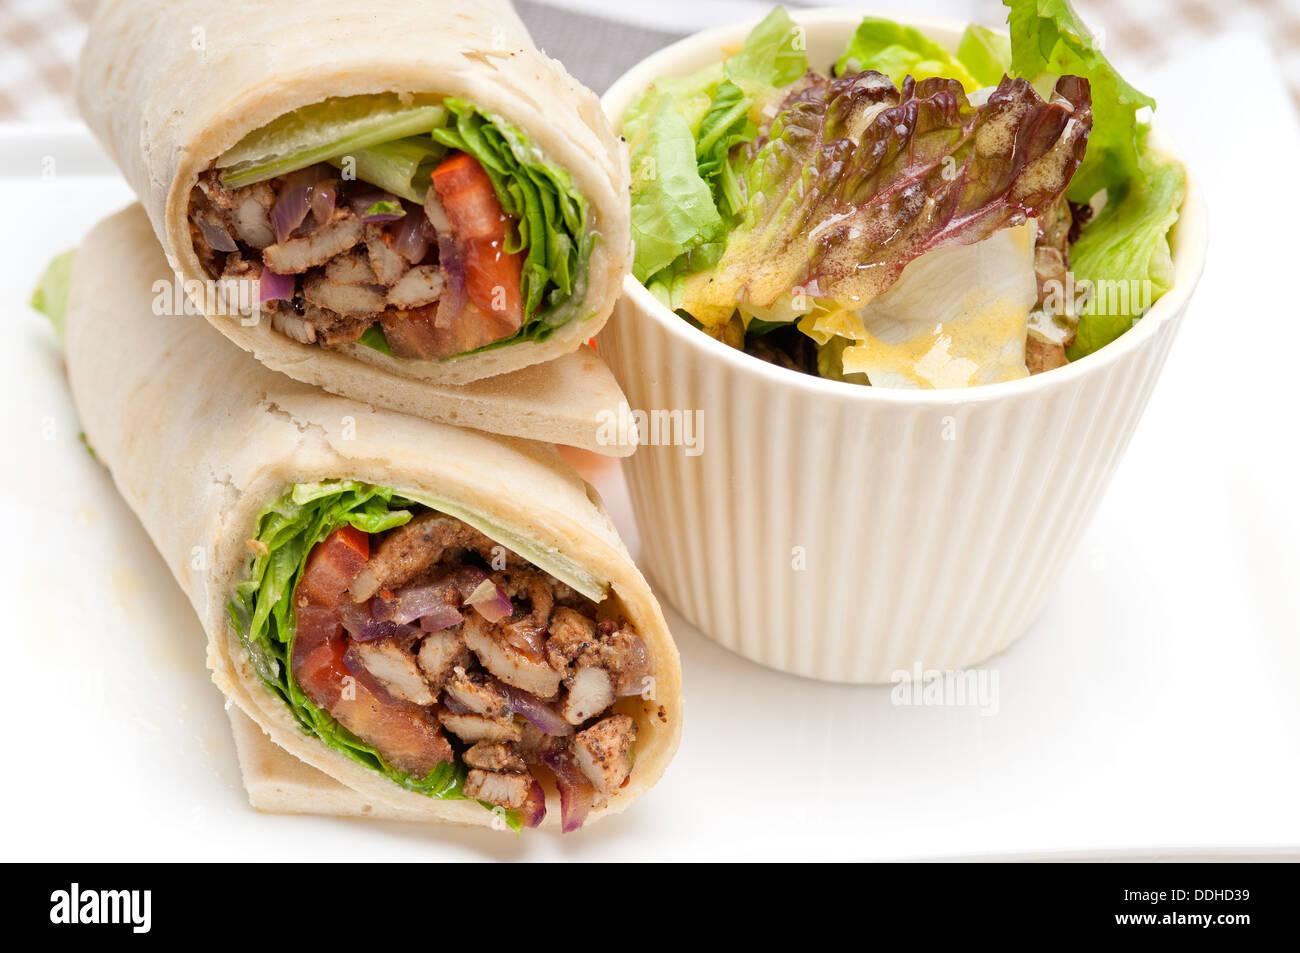 kafta shawarma chicken pita wrap roll sandwich traditional